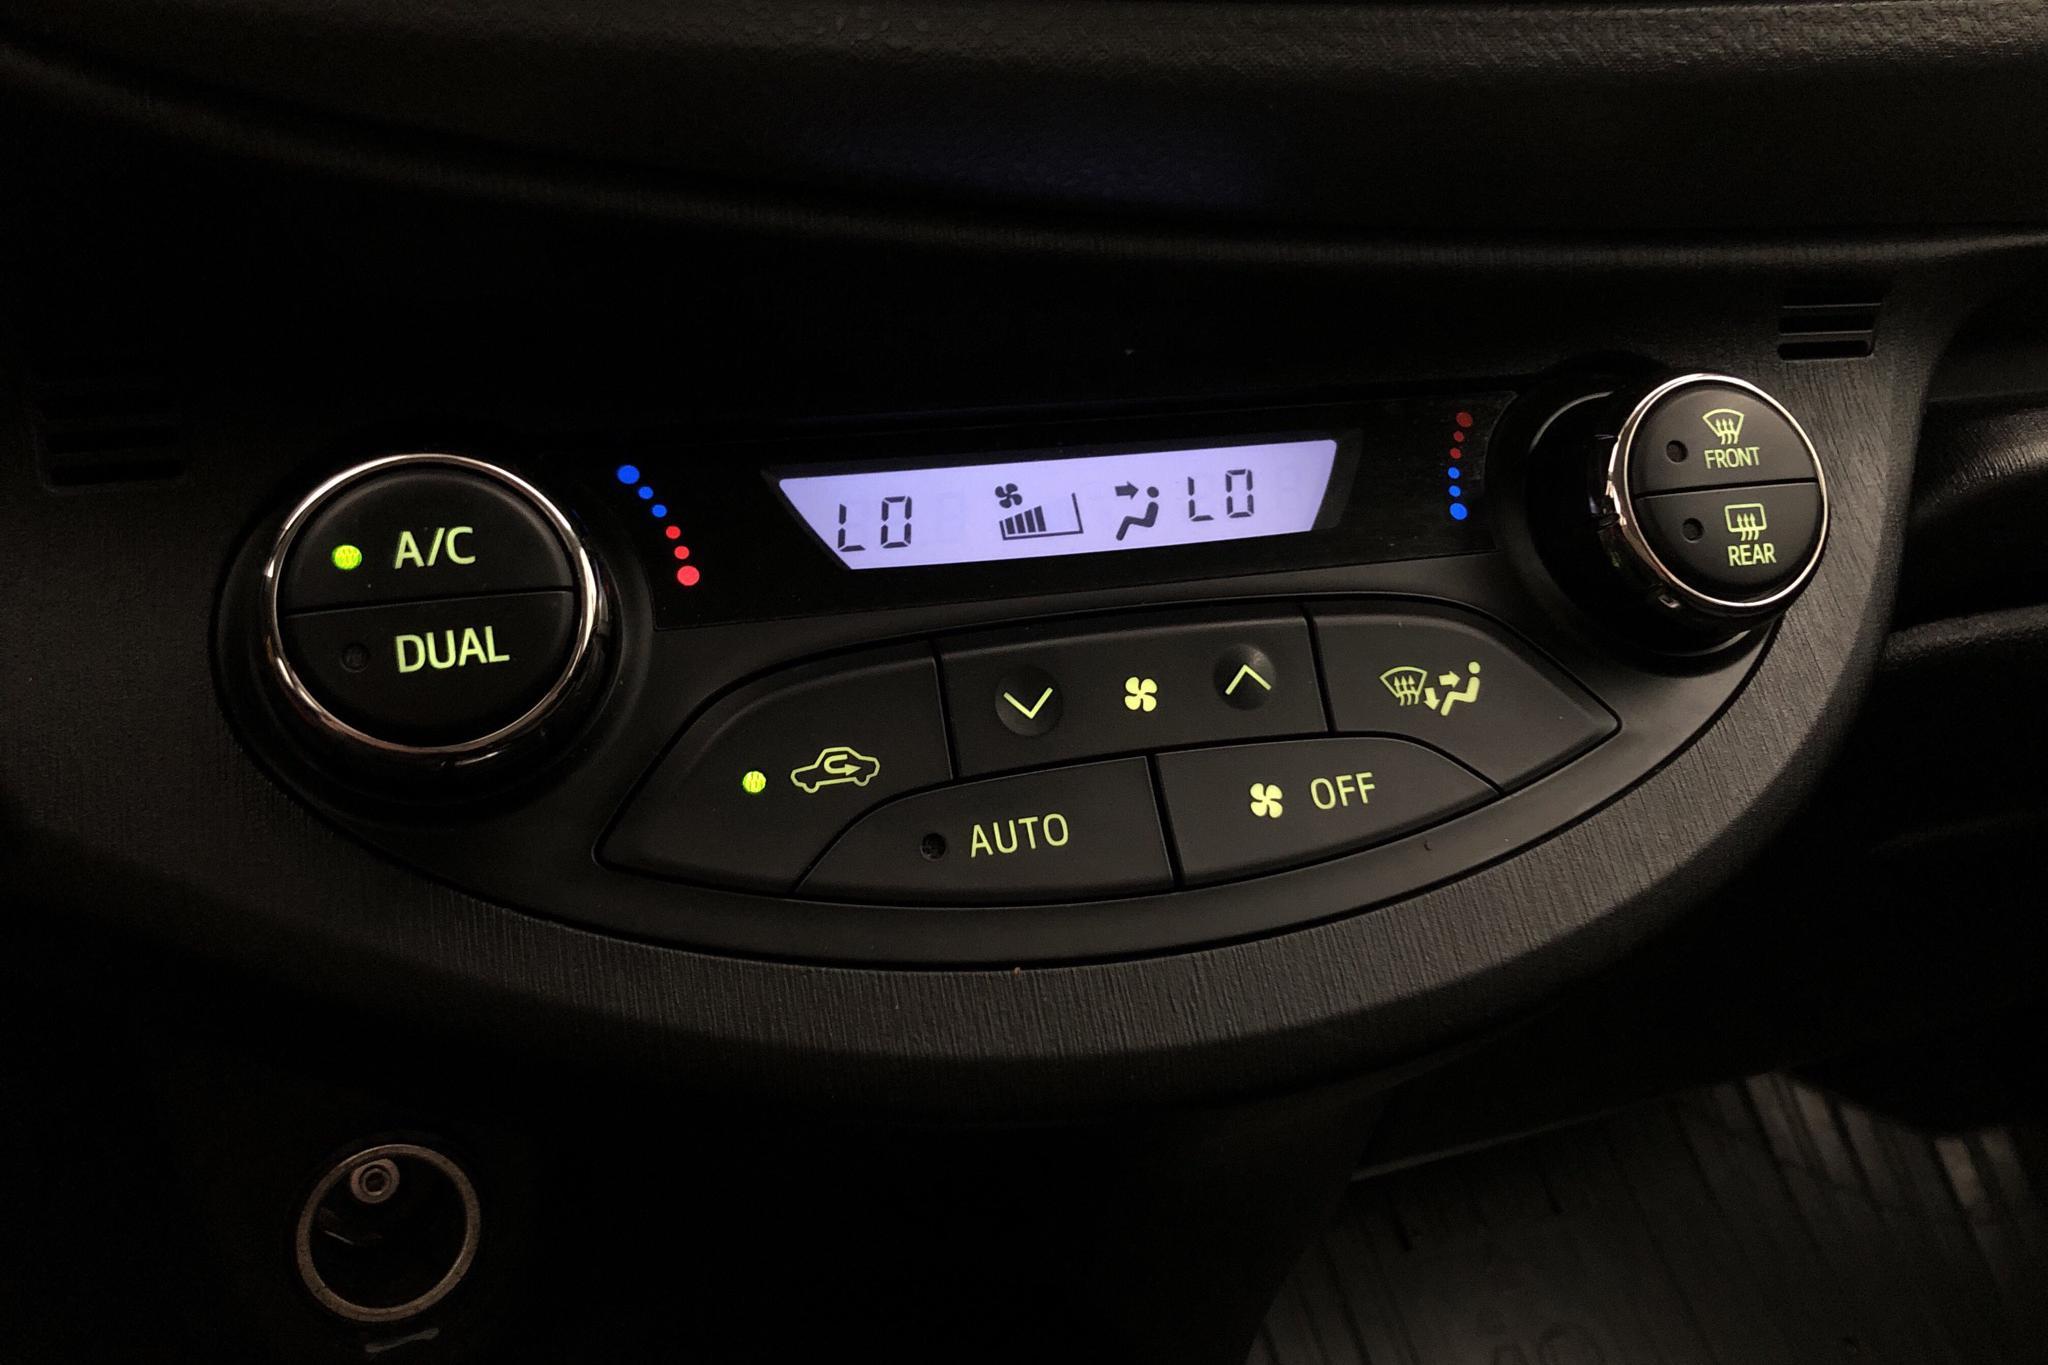 Toyota Yaris 1.5 HSD 5dr (75hk) - 10 781 mil - Automat - röd - 2013